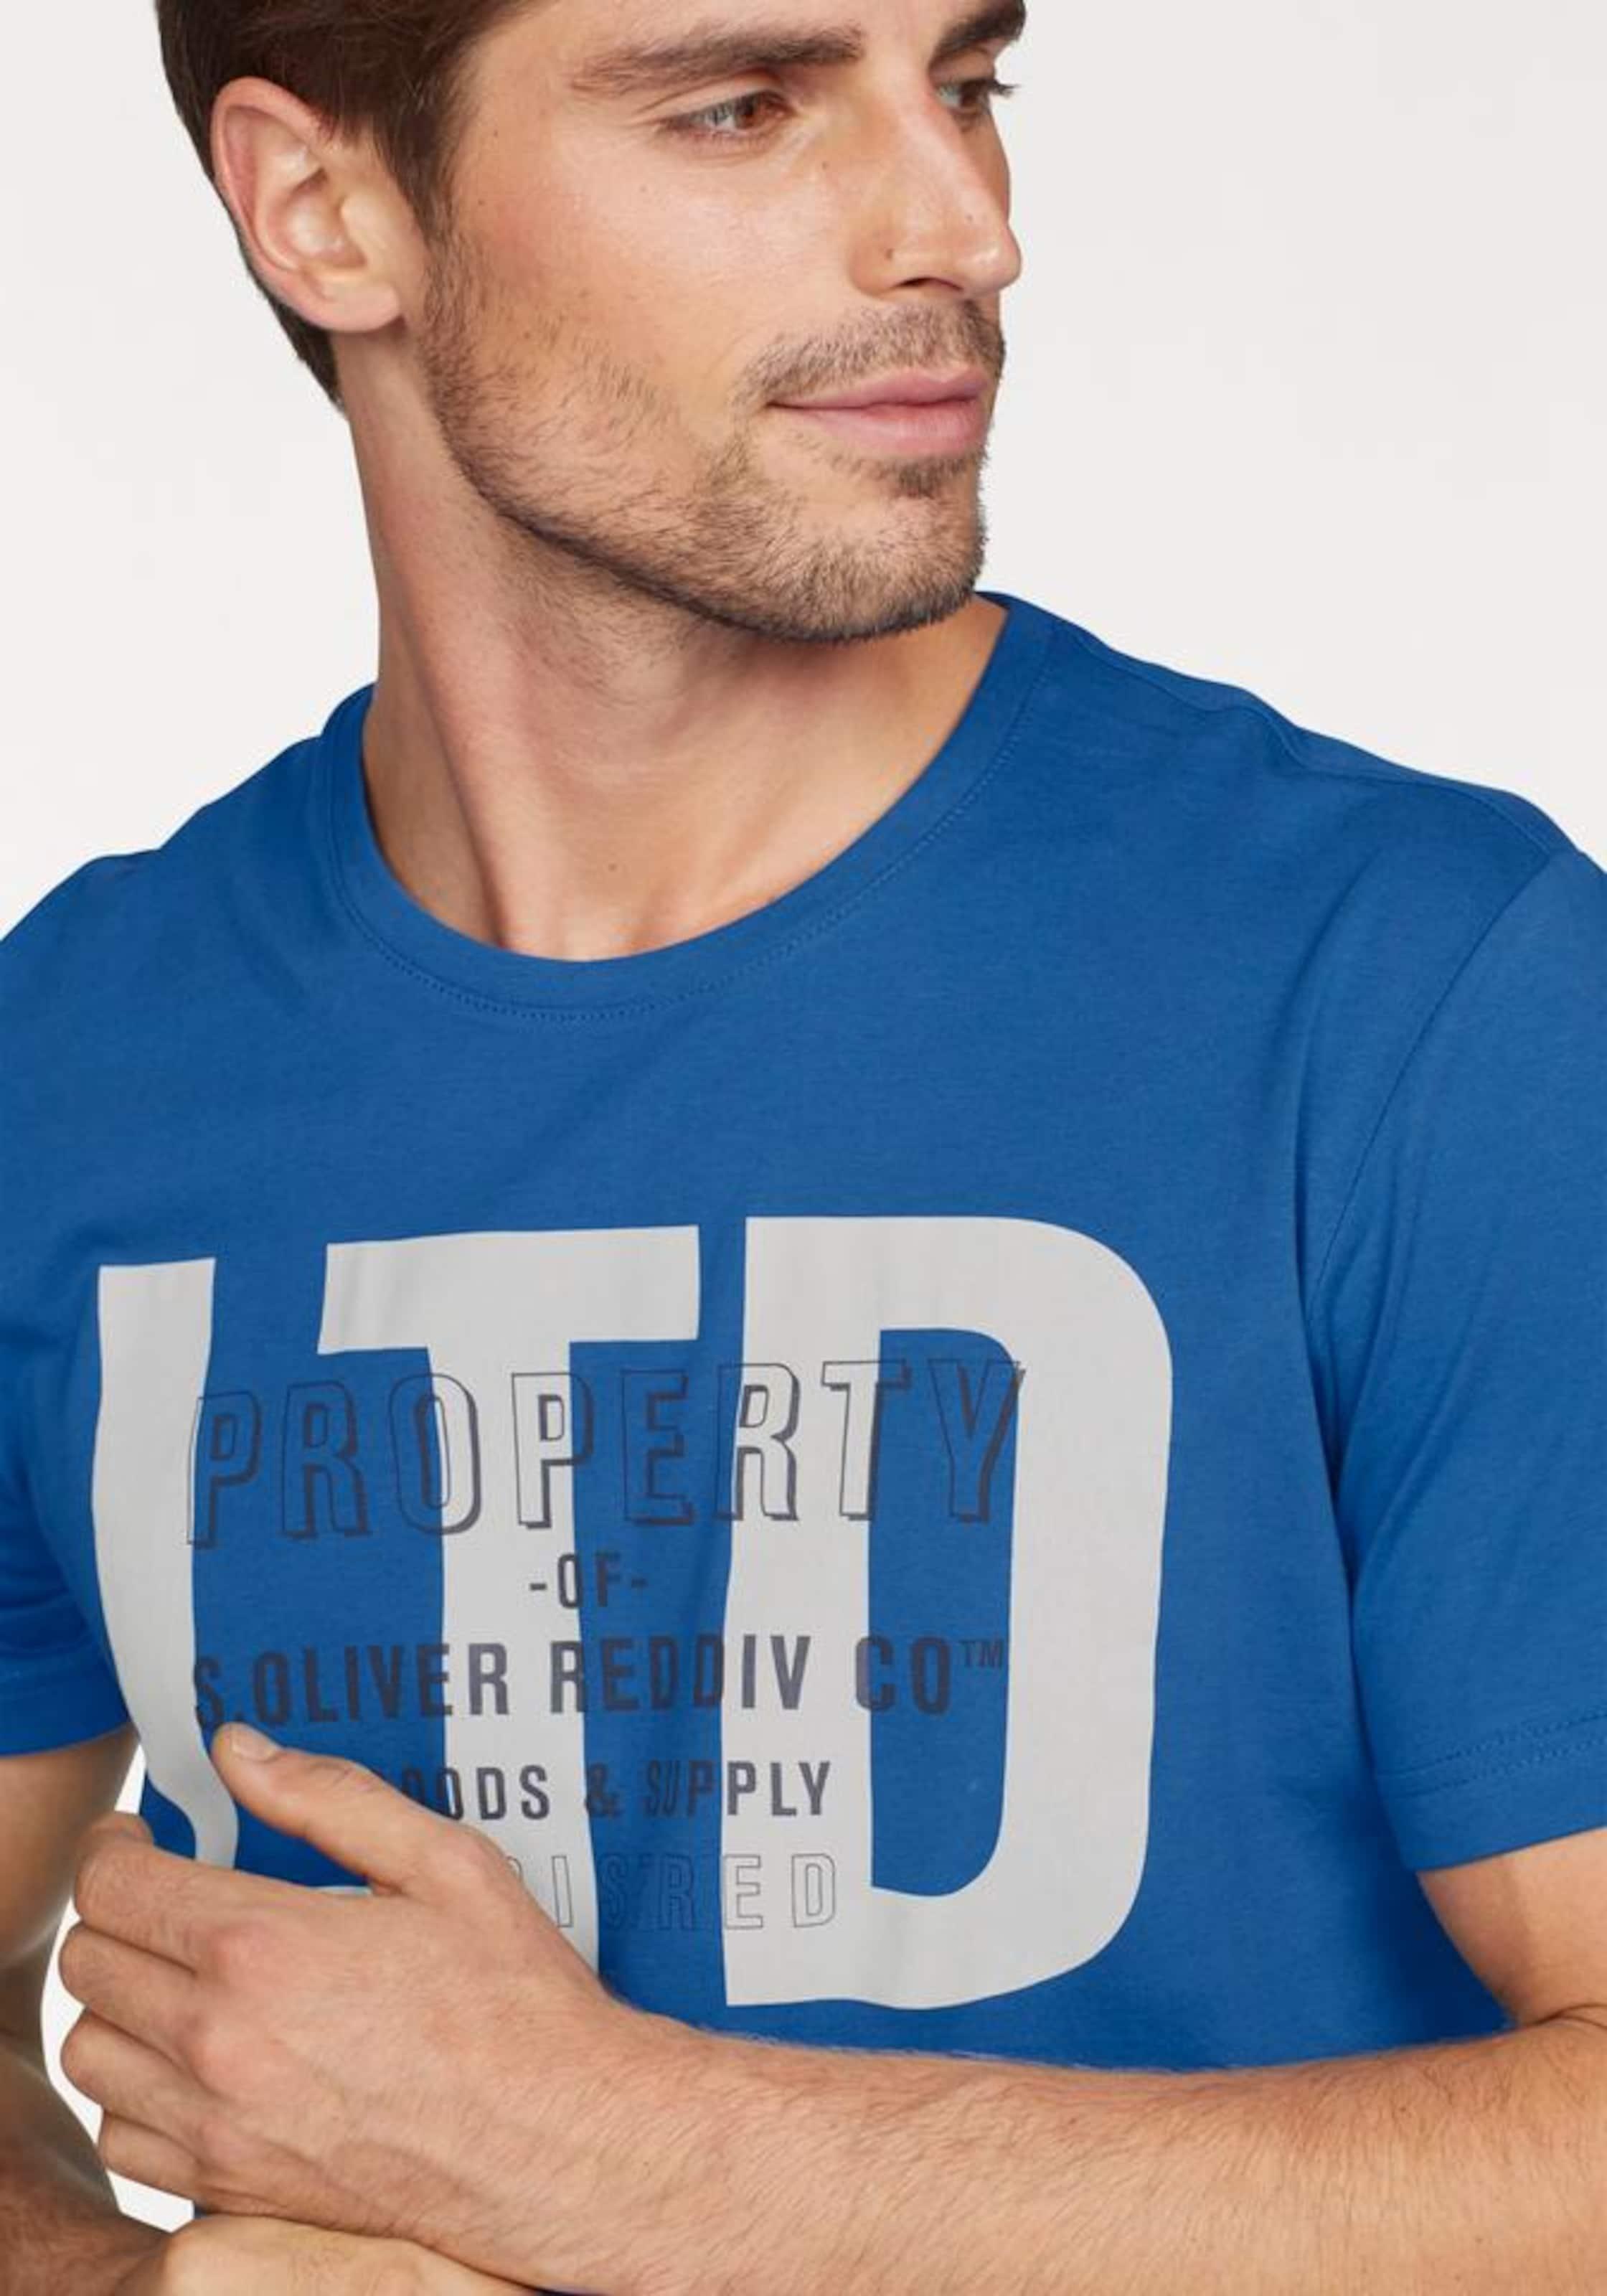 Outlet Beste Geschäft Zu Bekommen s.Oliver RED LABEL T-Shirt P Manchester Online Günstig Kaufen Outlet-Store Xt3pF